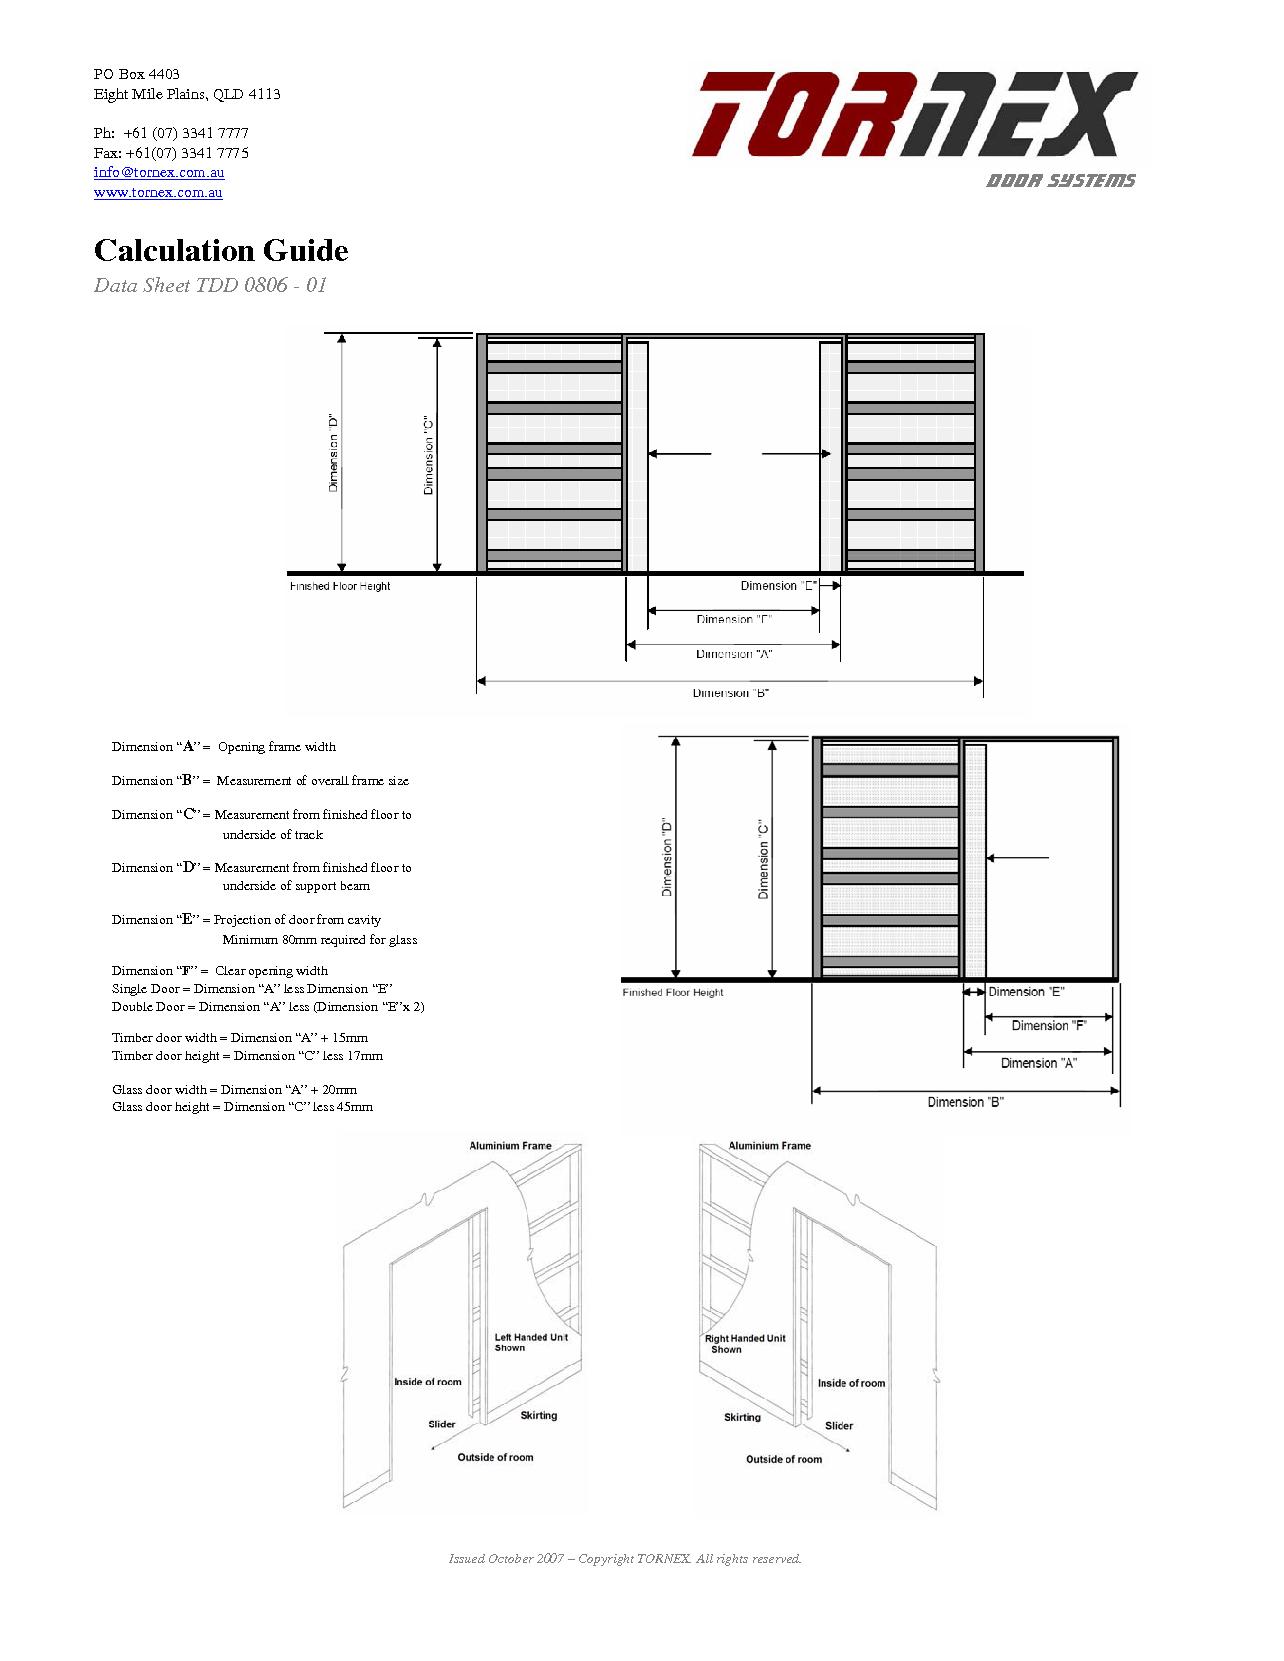 Tornex Calculation Guide0001.png 1,284×1,661 Pixels